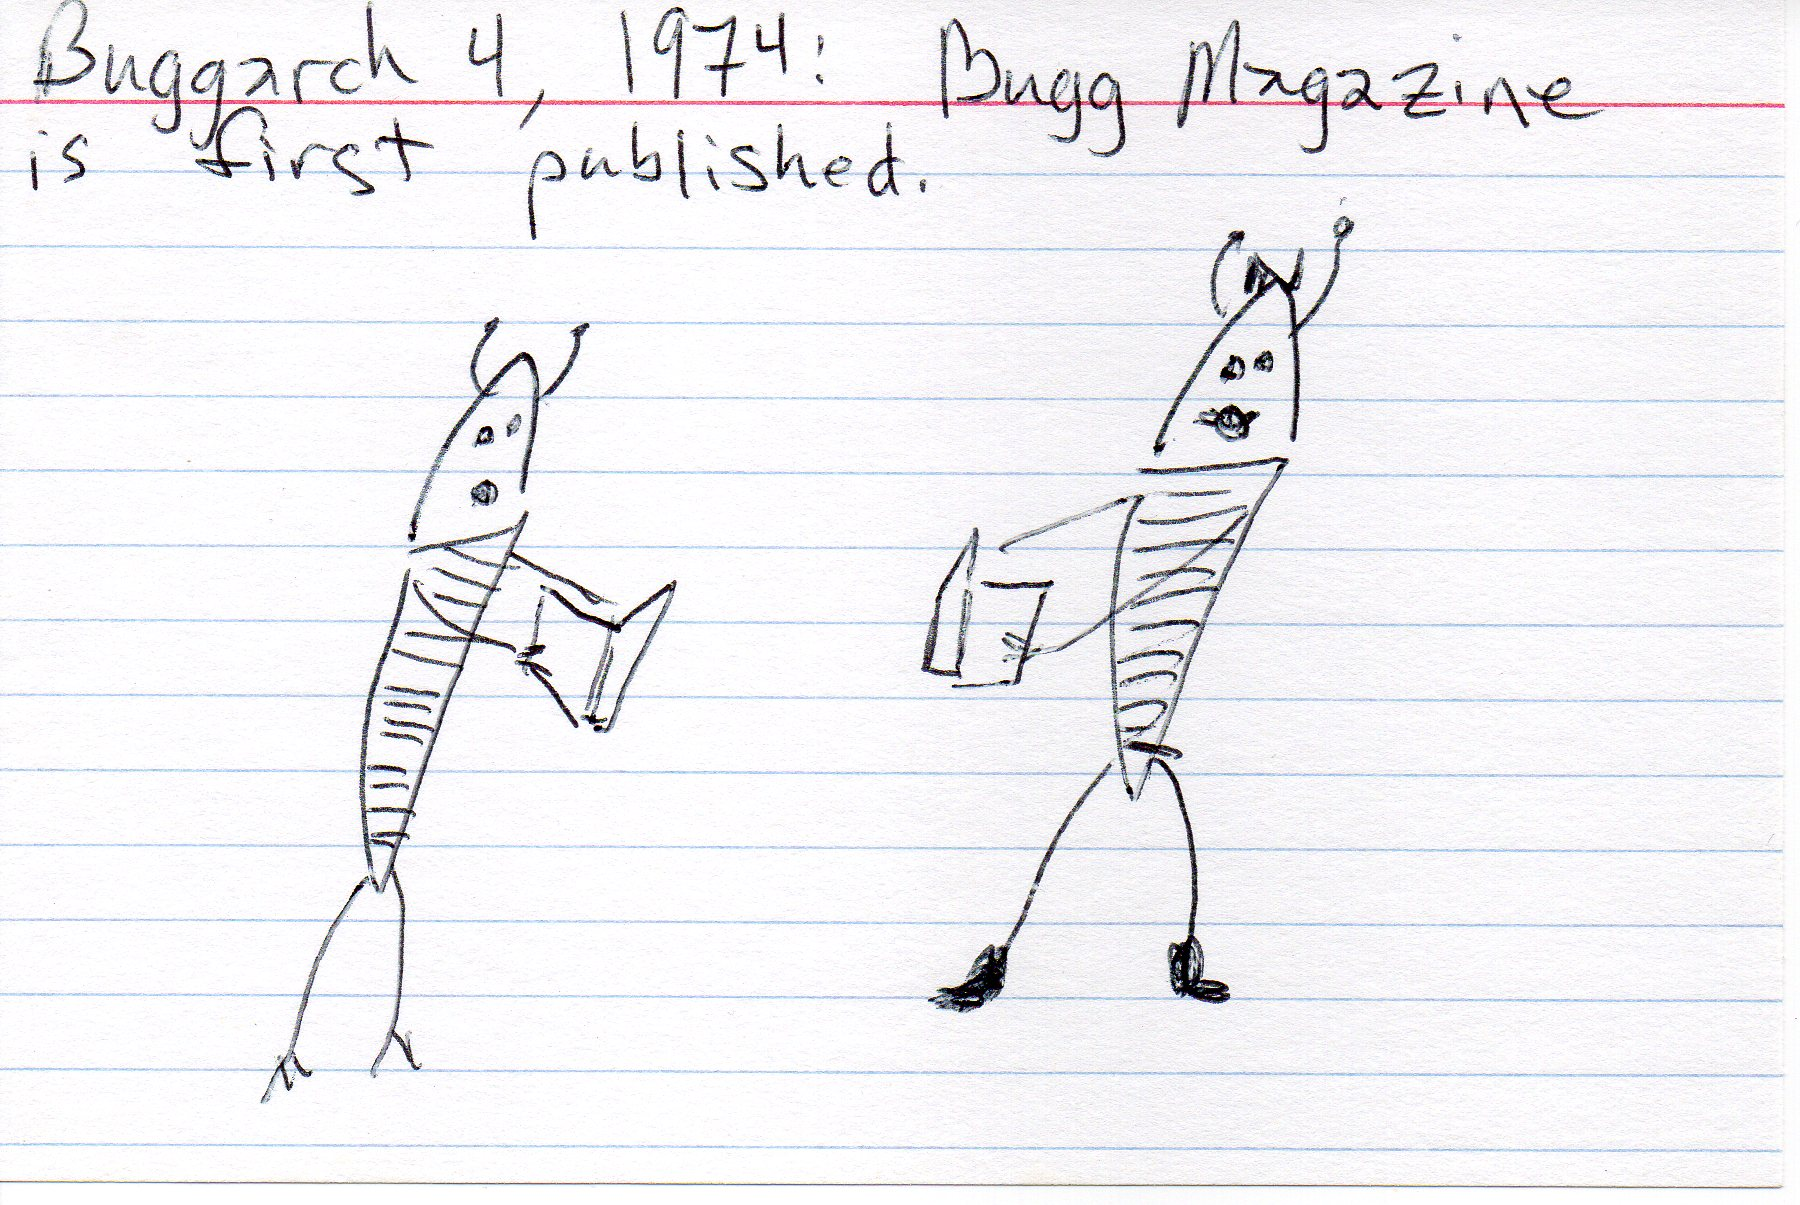 Bugg Magazine [click to embiggen]